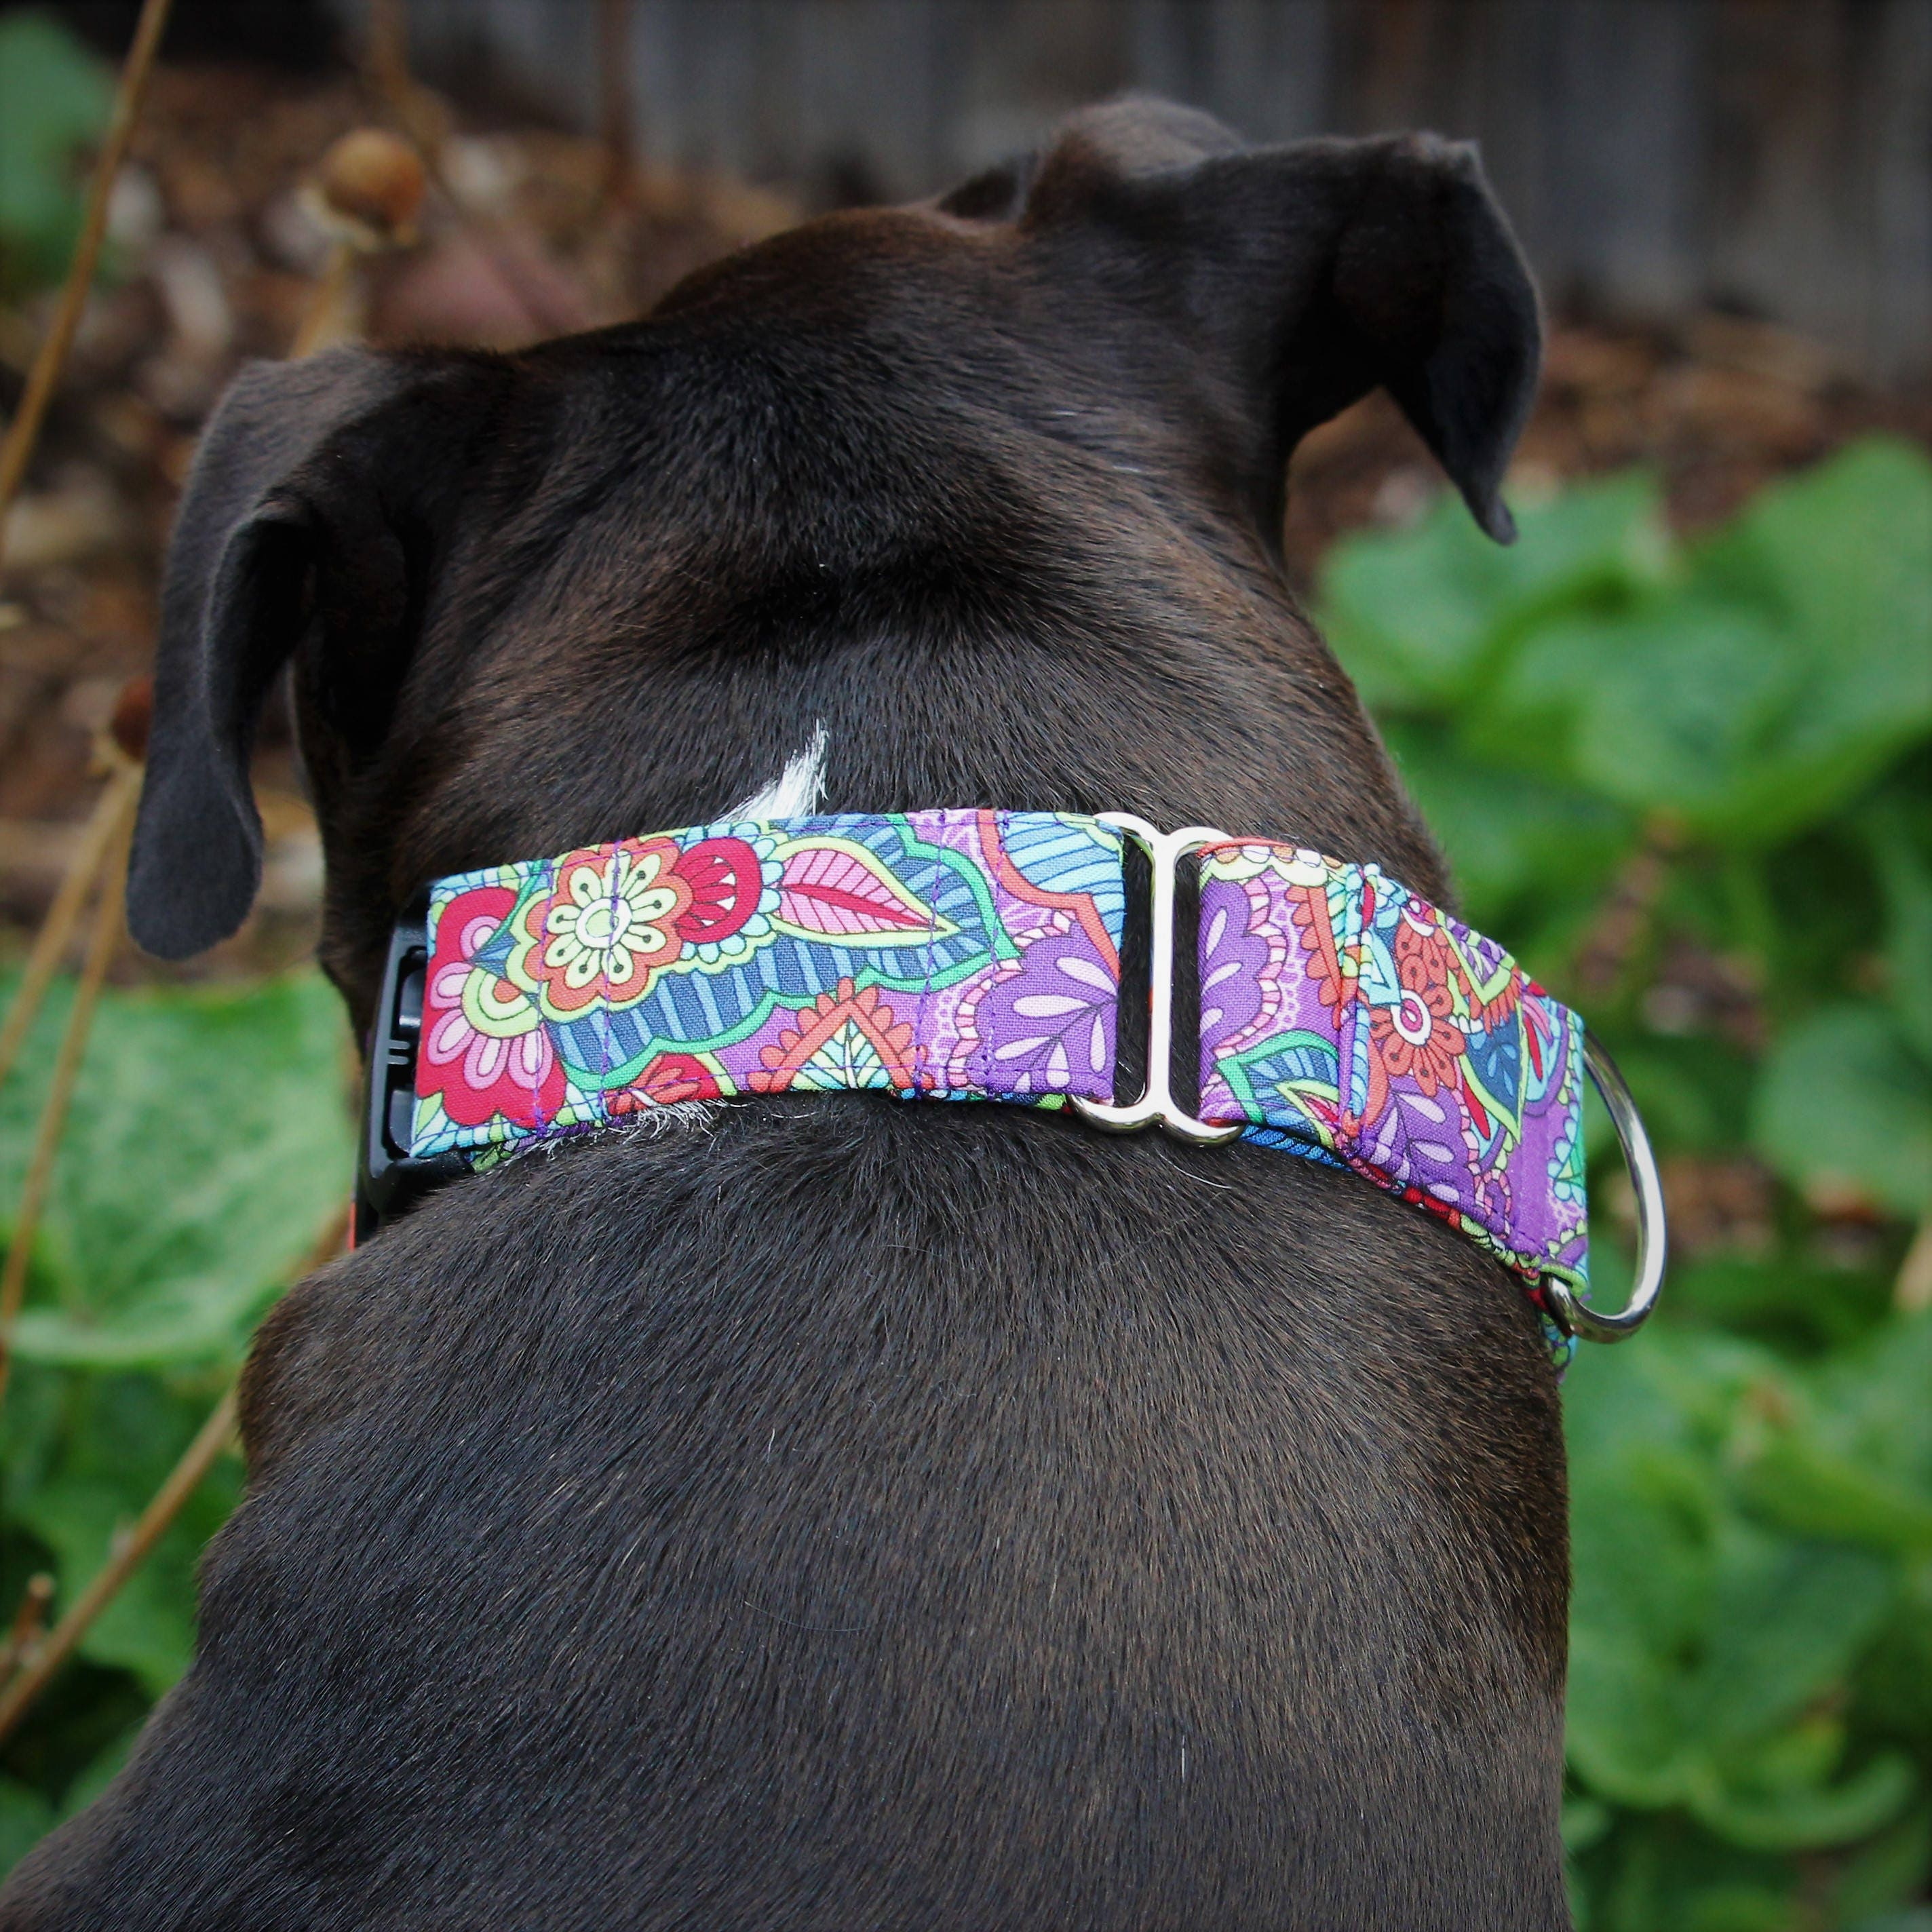 Dog crib for sale philippines - Purple Dog Collar Flower Dog Collar Thick Dog Collar Wide Martingale Dog Collar Thick Dog Collar Extra Large Dog Collar Girl Collar